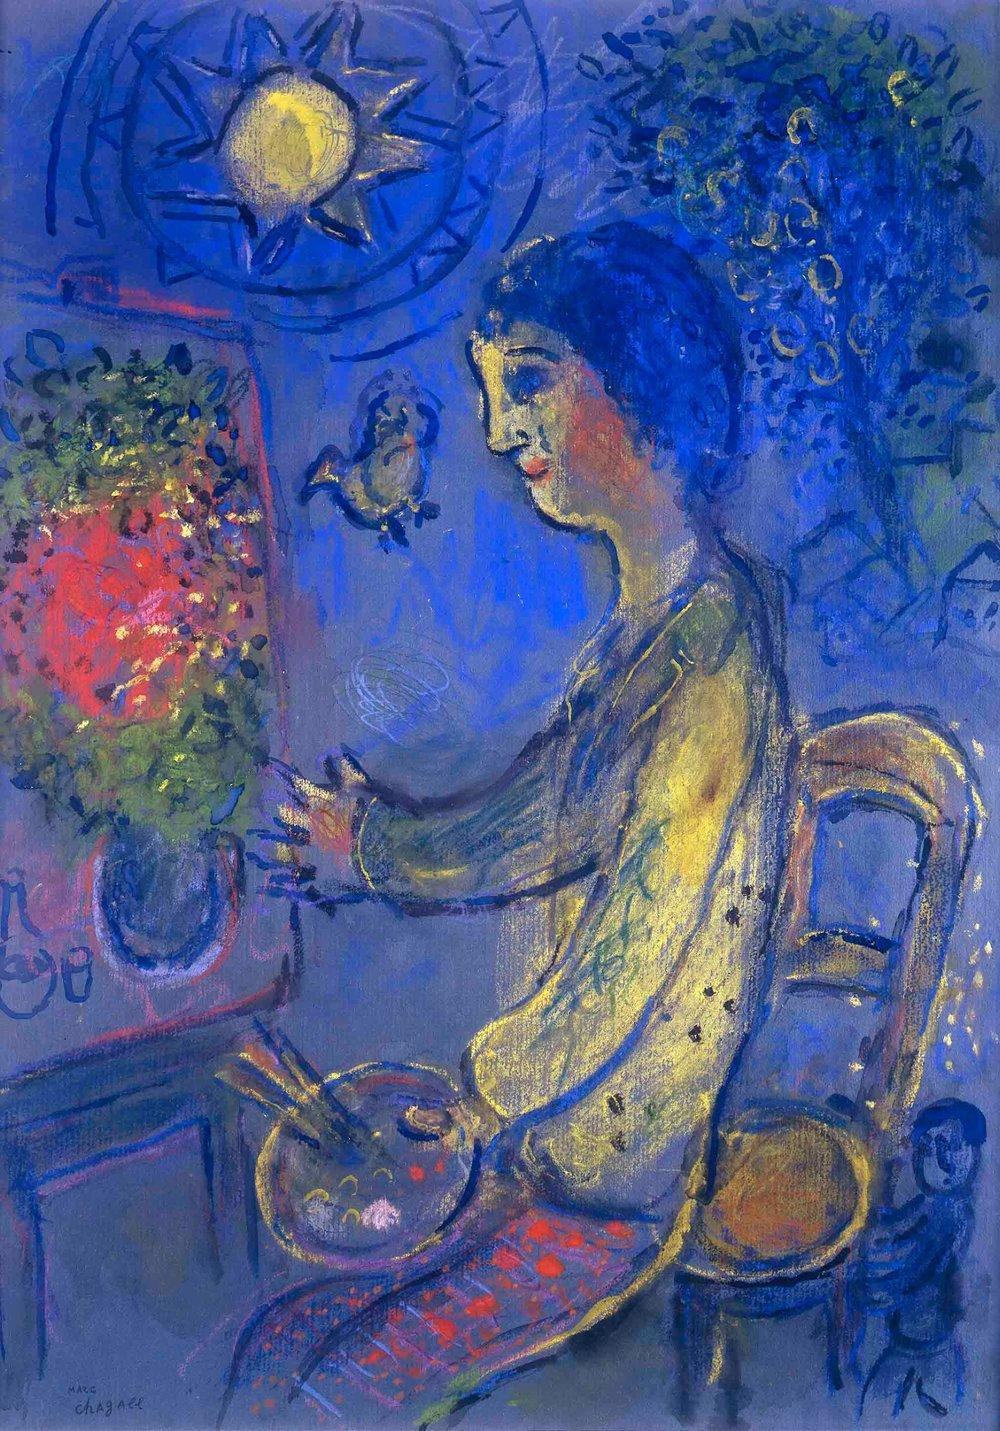 Chagall Le peintre en jaune email.jpg